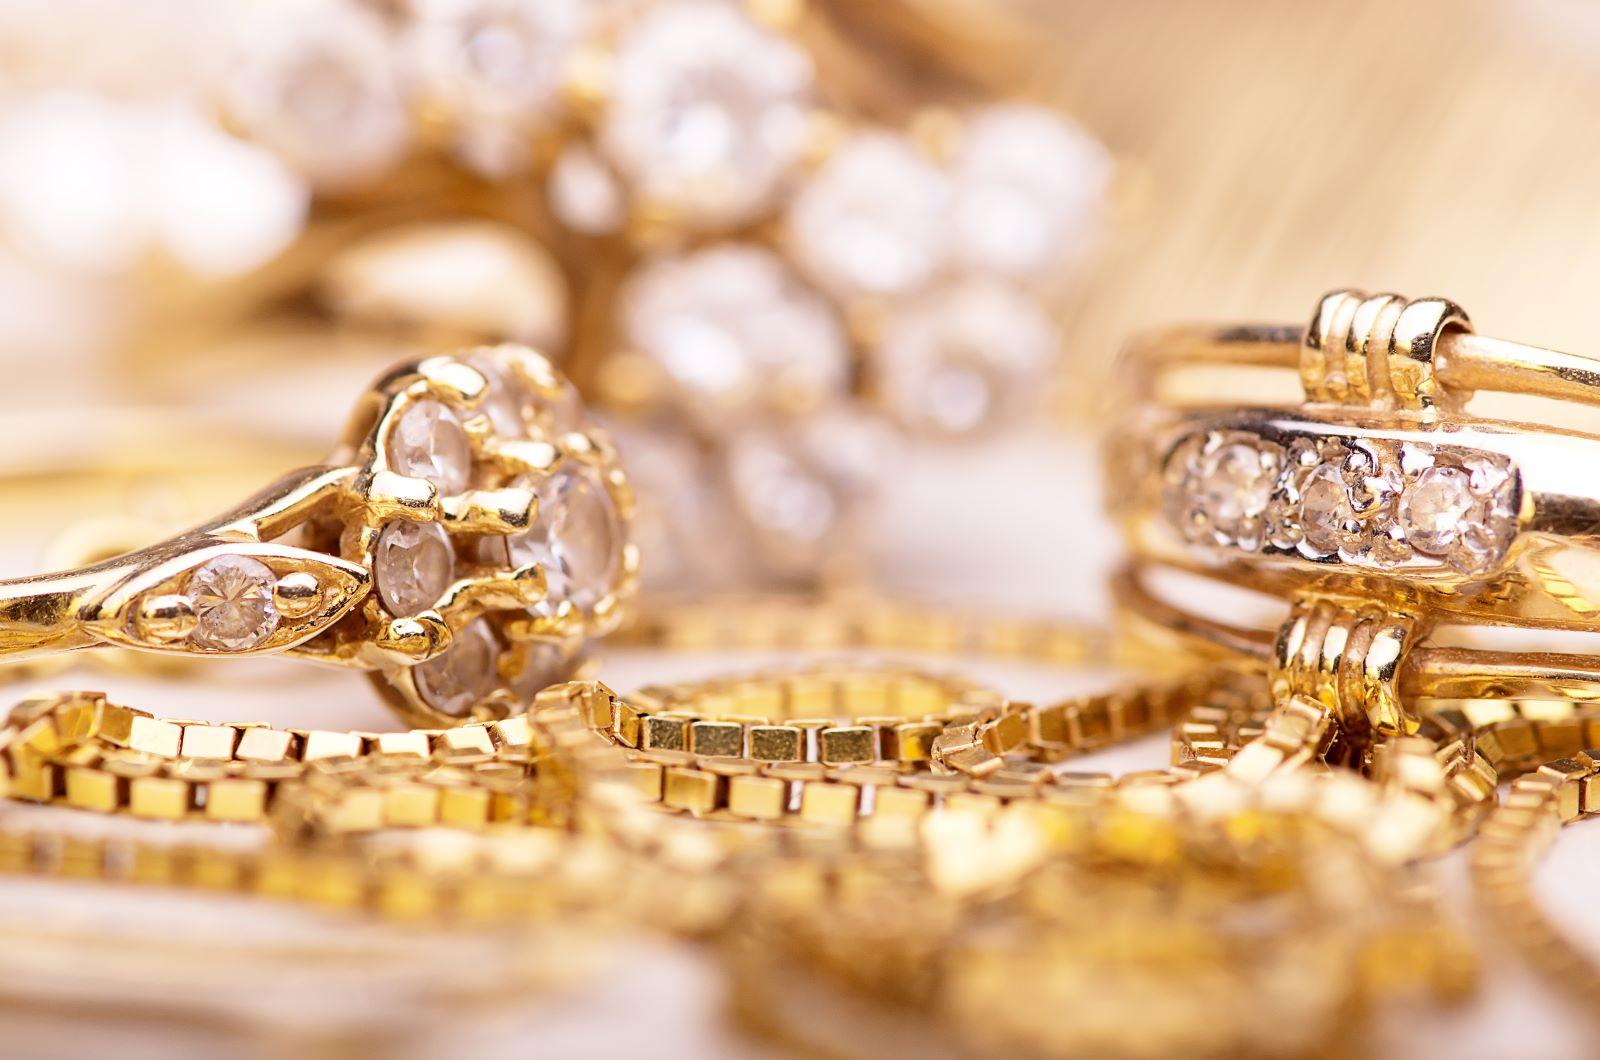 Nahaufnahme verschiedene goldene Schmuckstücke